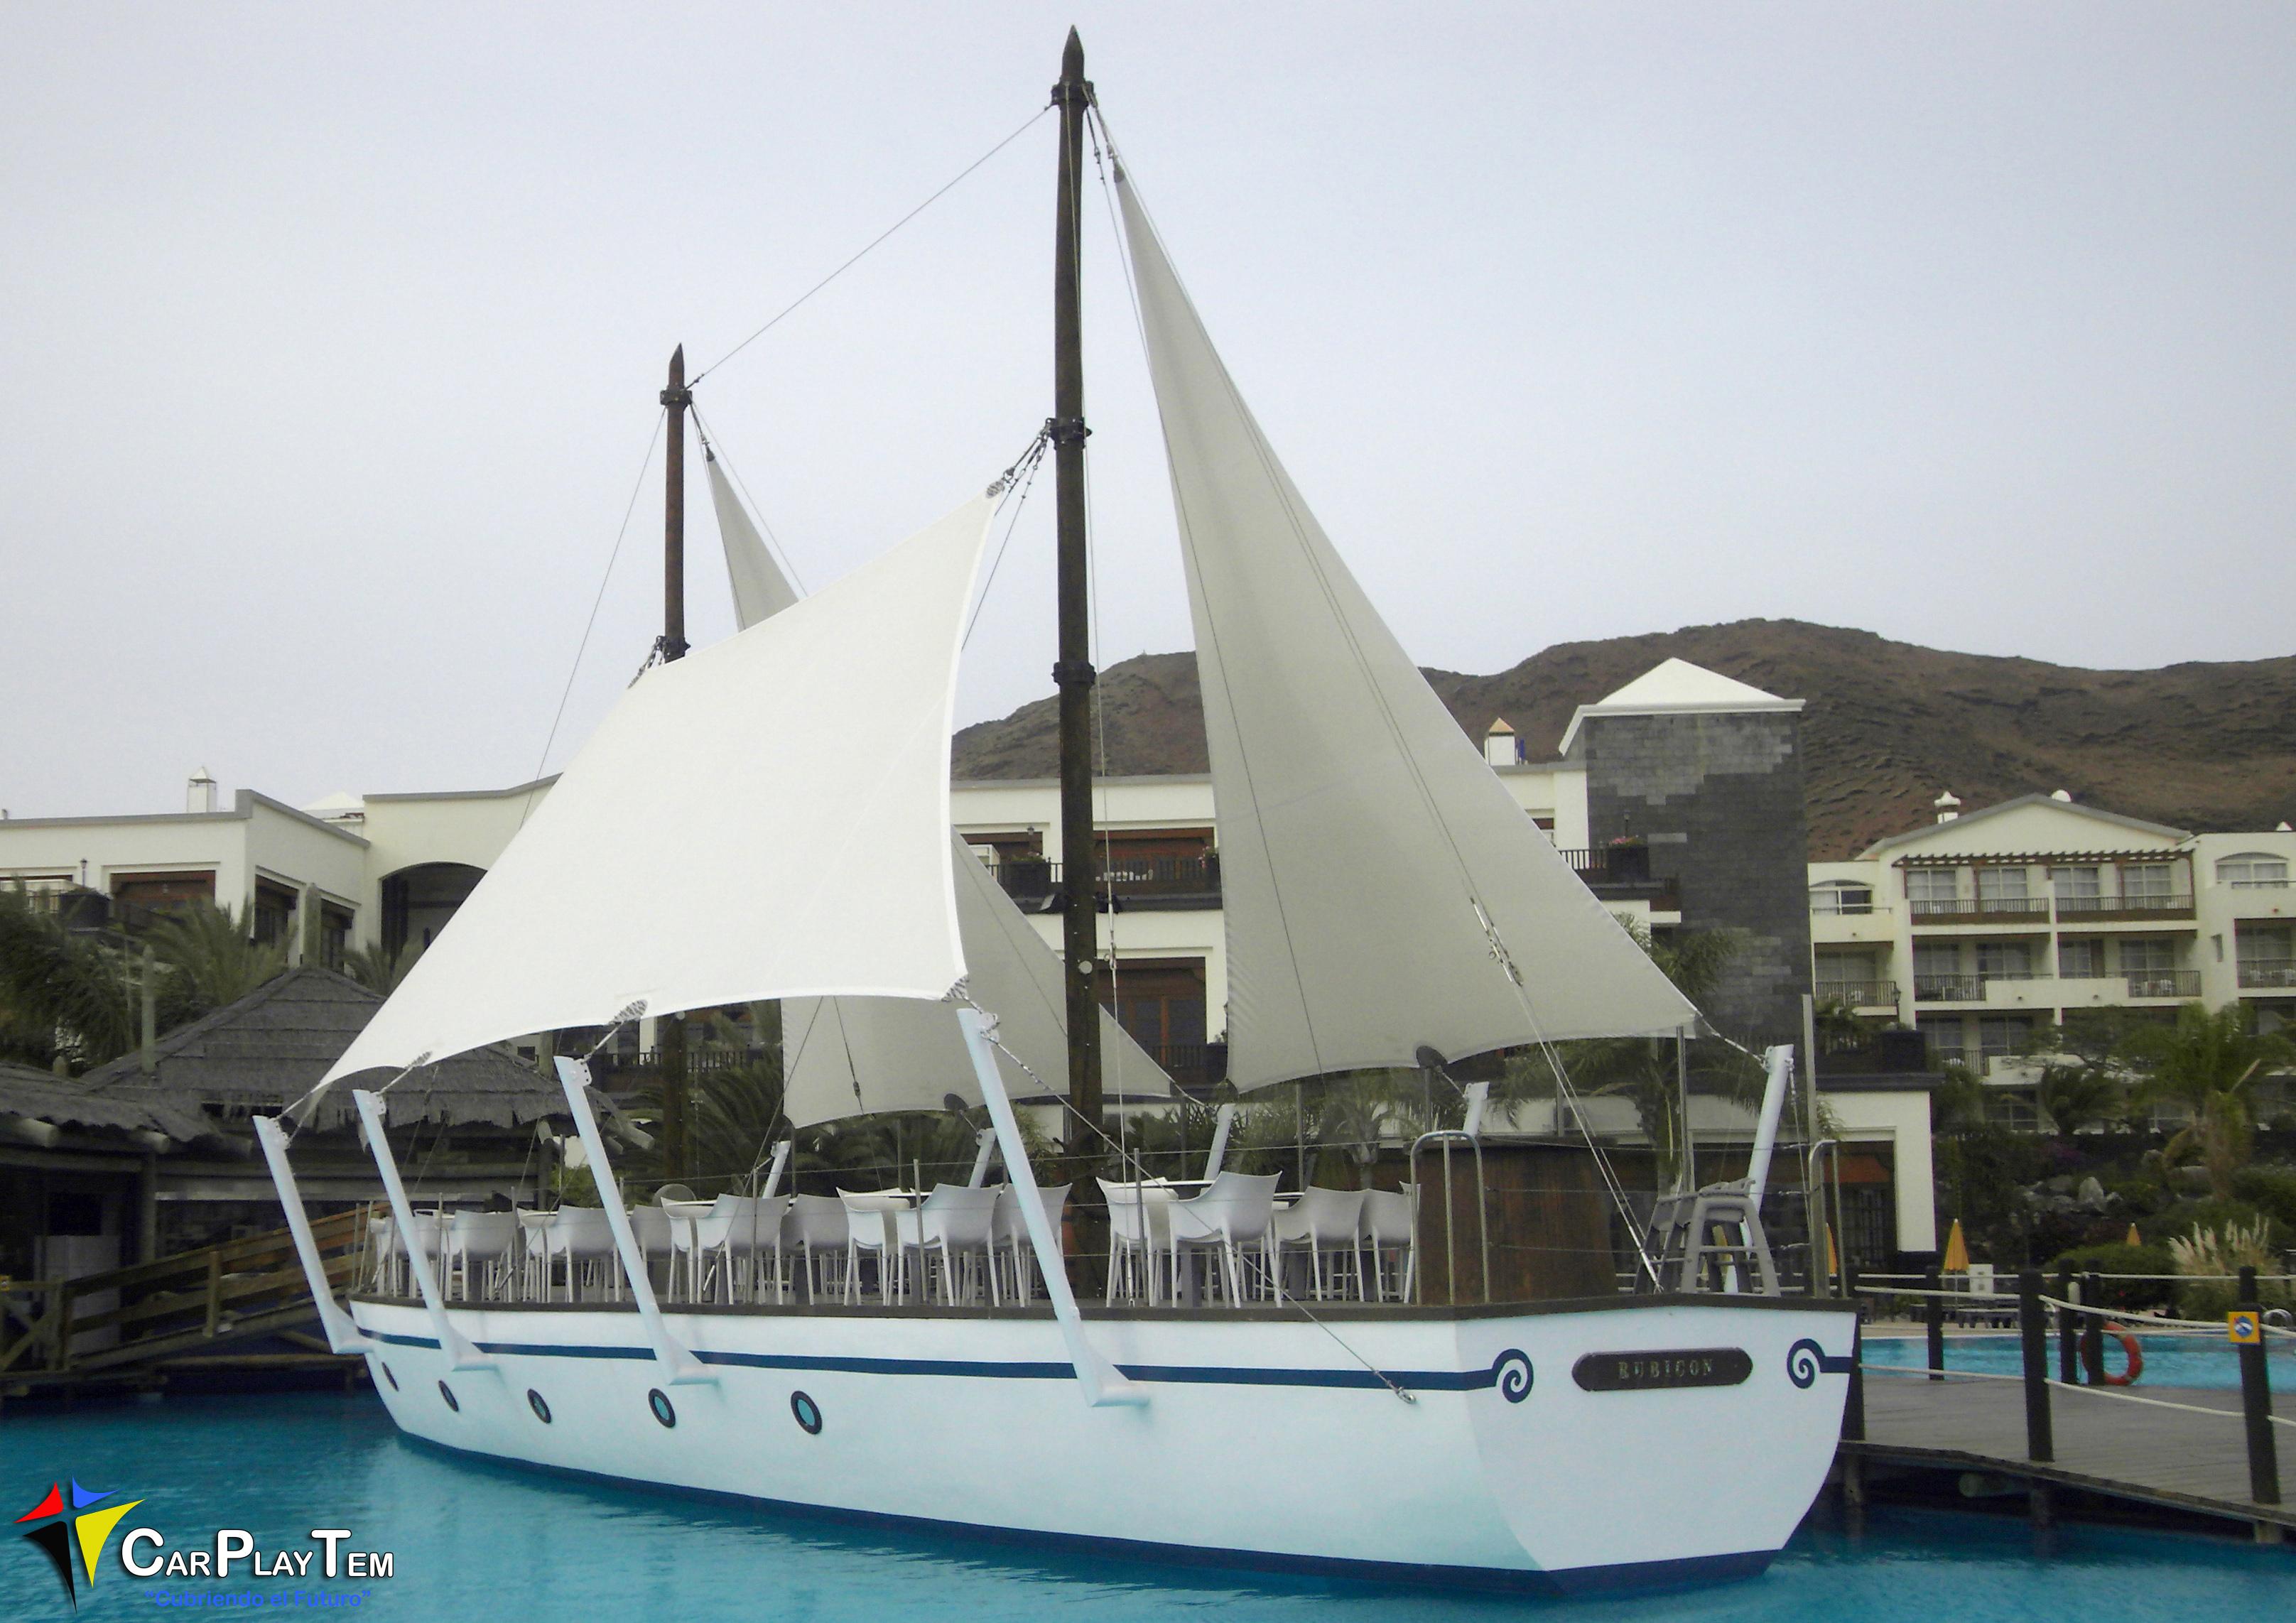 Velas Barco Restaurante Piscina en Hotel H10 Rubicon. Playa Blanca.Lanzarote